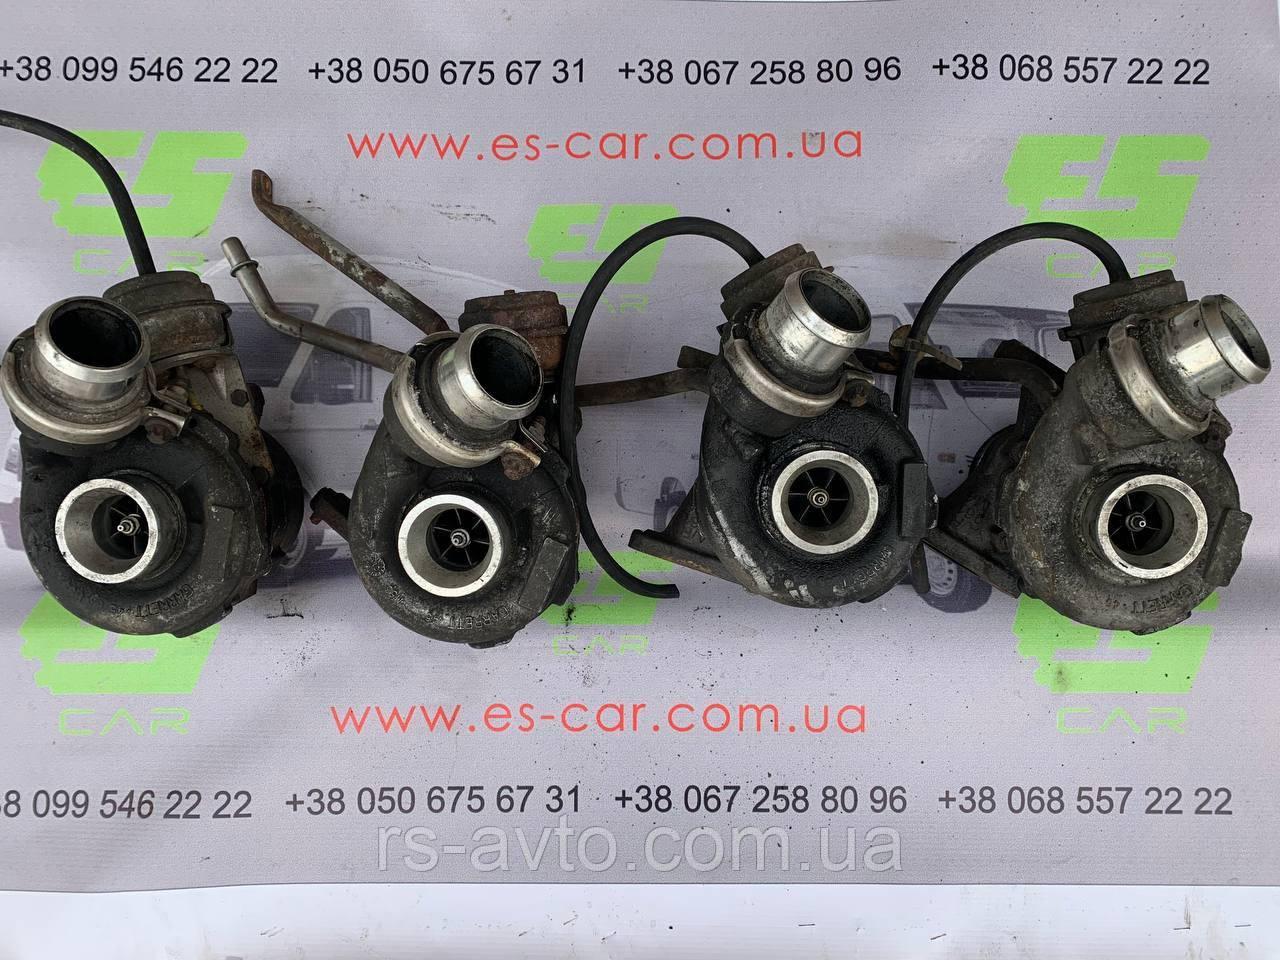 Турбіни MB Sprinter 2.2 - 2.7 CDI OM 611 - 612 00-06